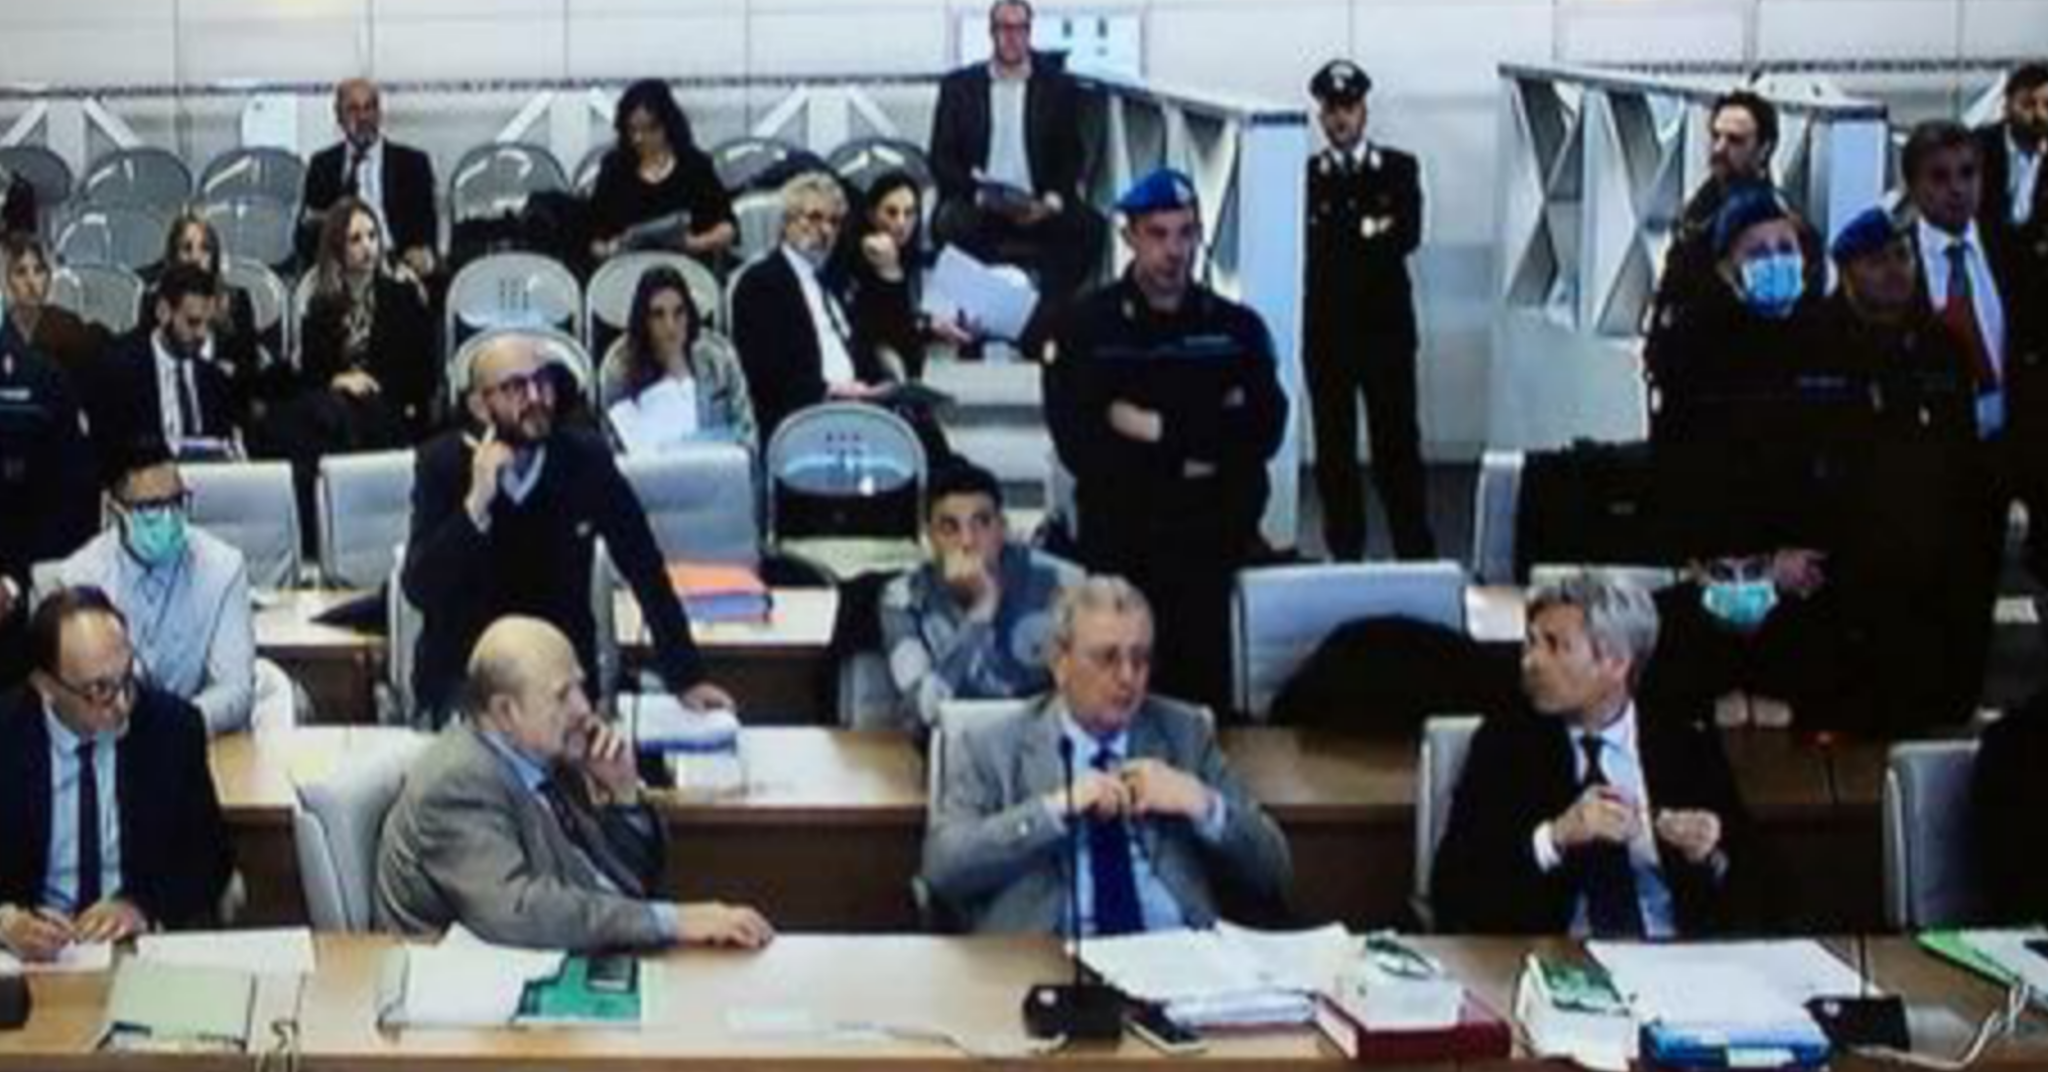 tribunale-udienza